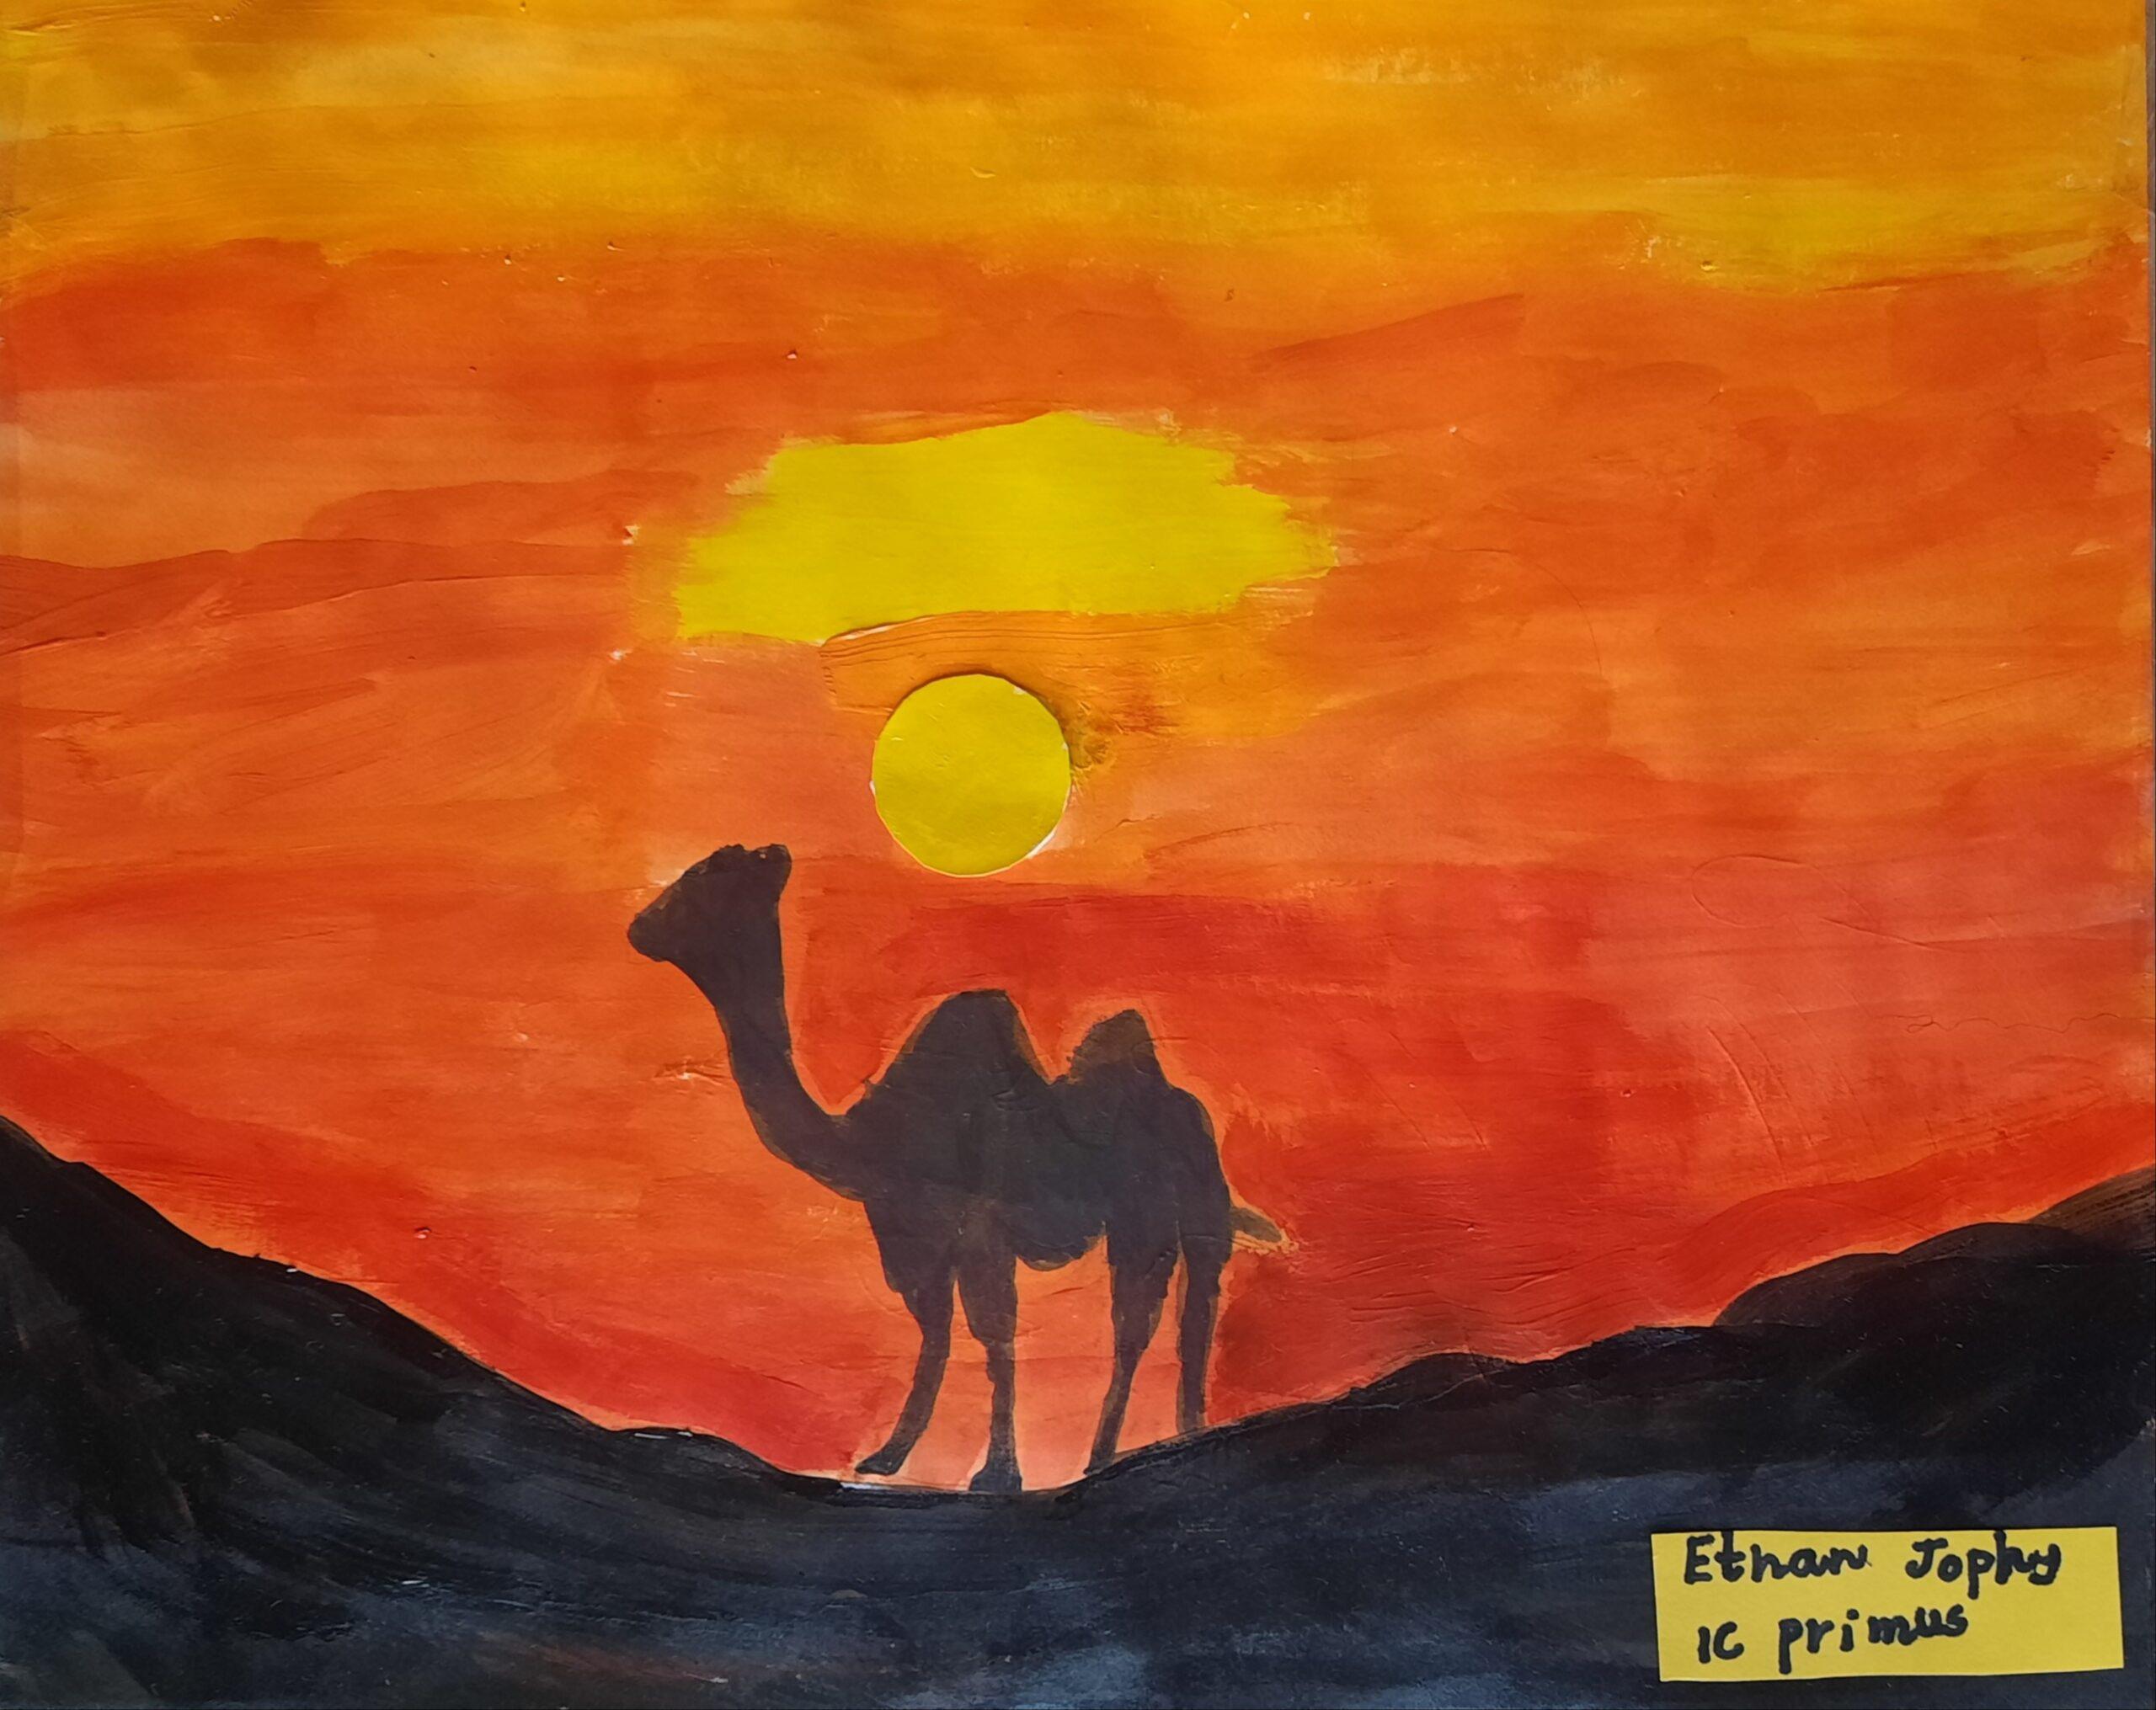 Journey through the Desert by Ethan Thomas Jophy